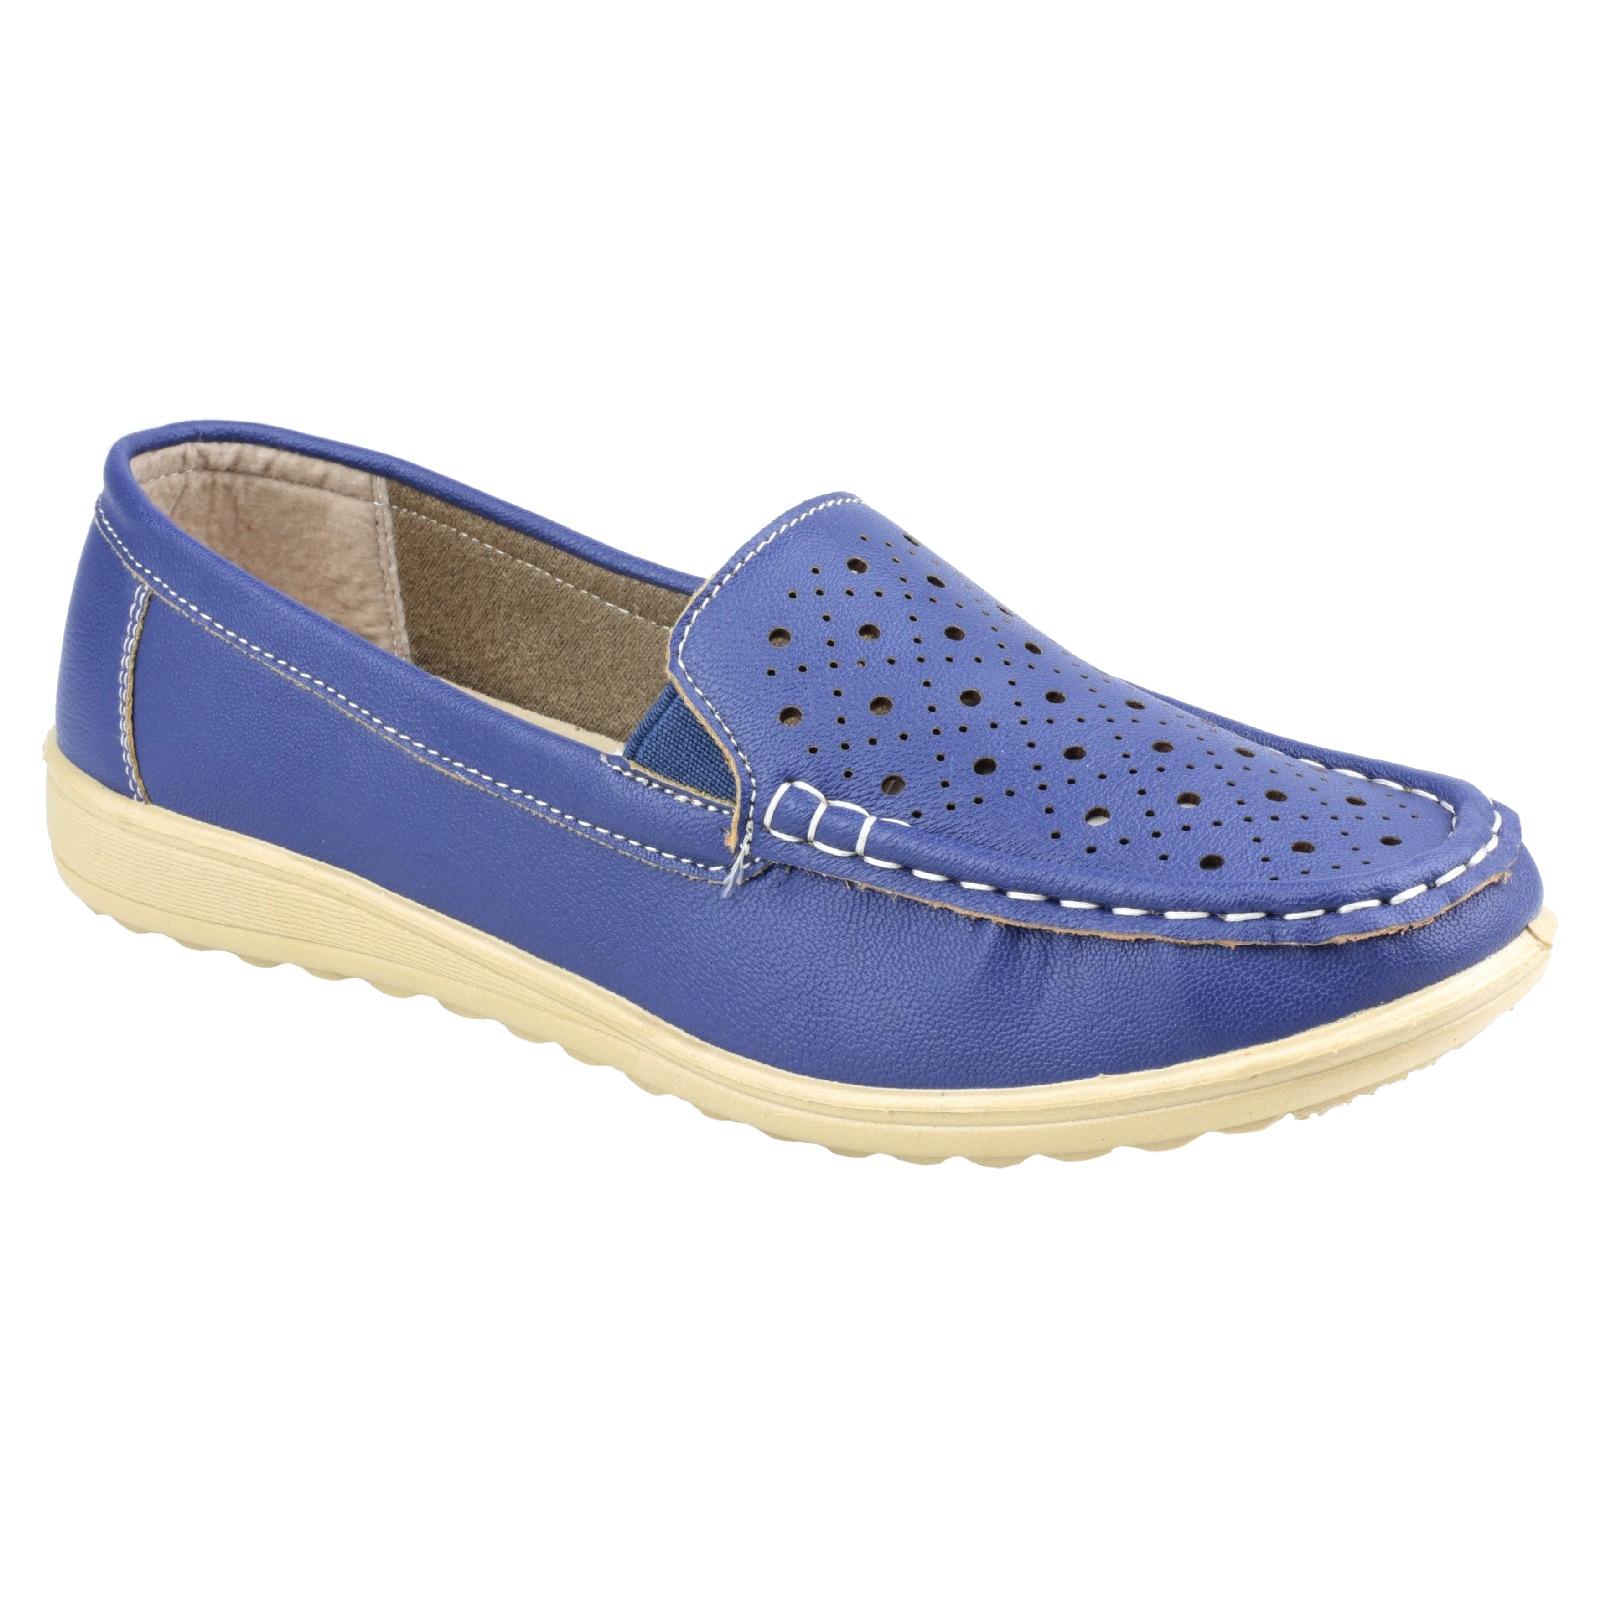 Image of Amblers Safety Mokassin »Cherwell Damen Schuhe«